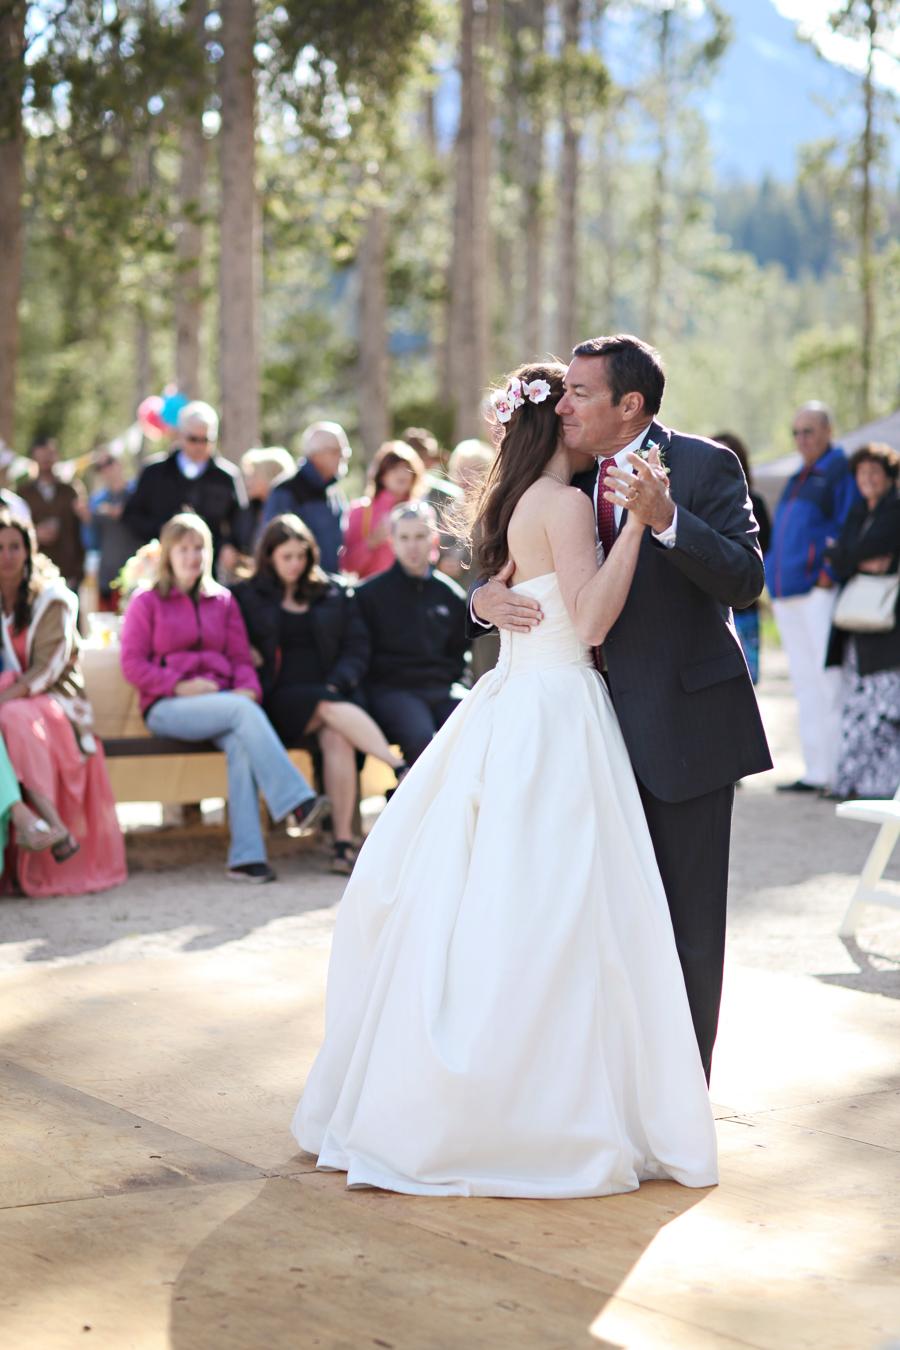 Weddings 171 Kristin Cheatwood Sun Valley Id Ketchum